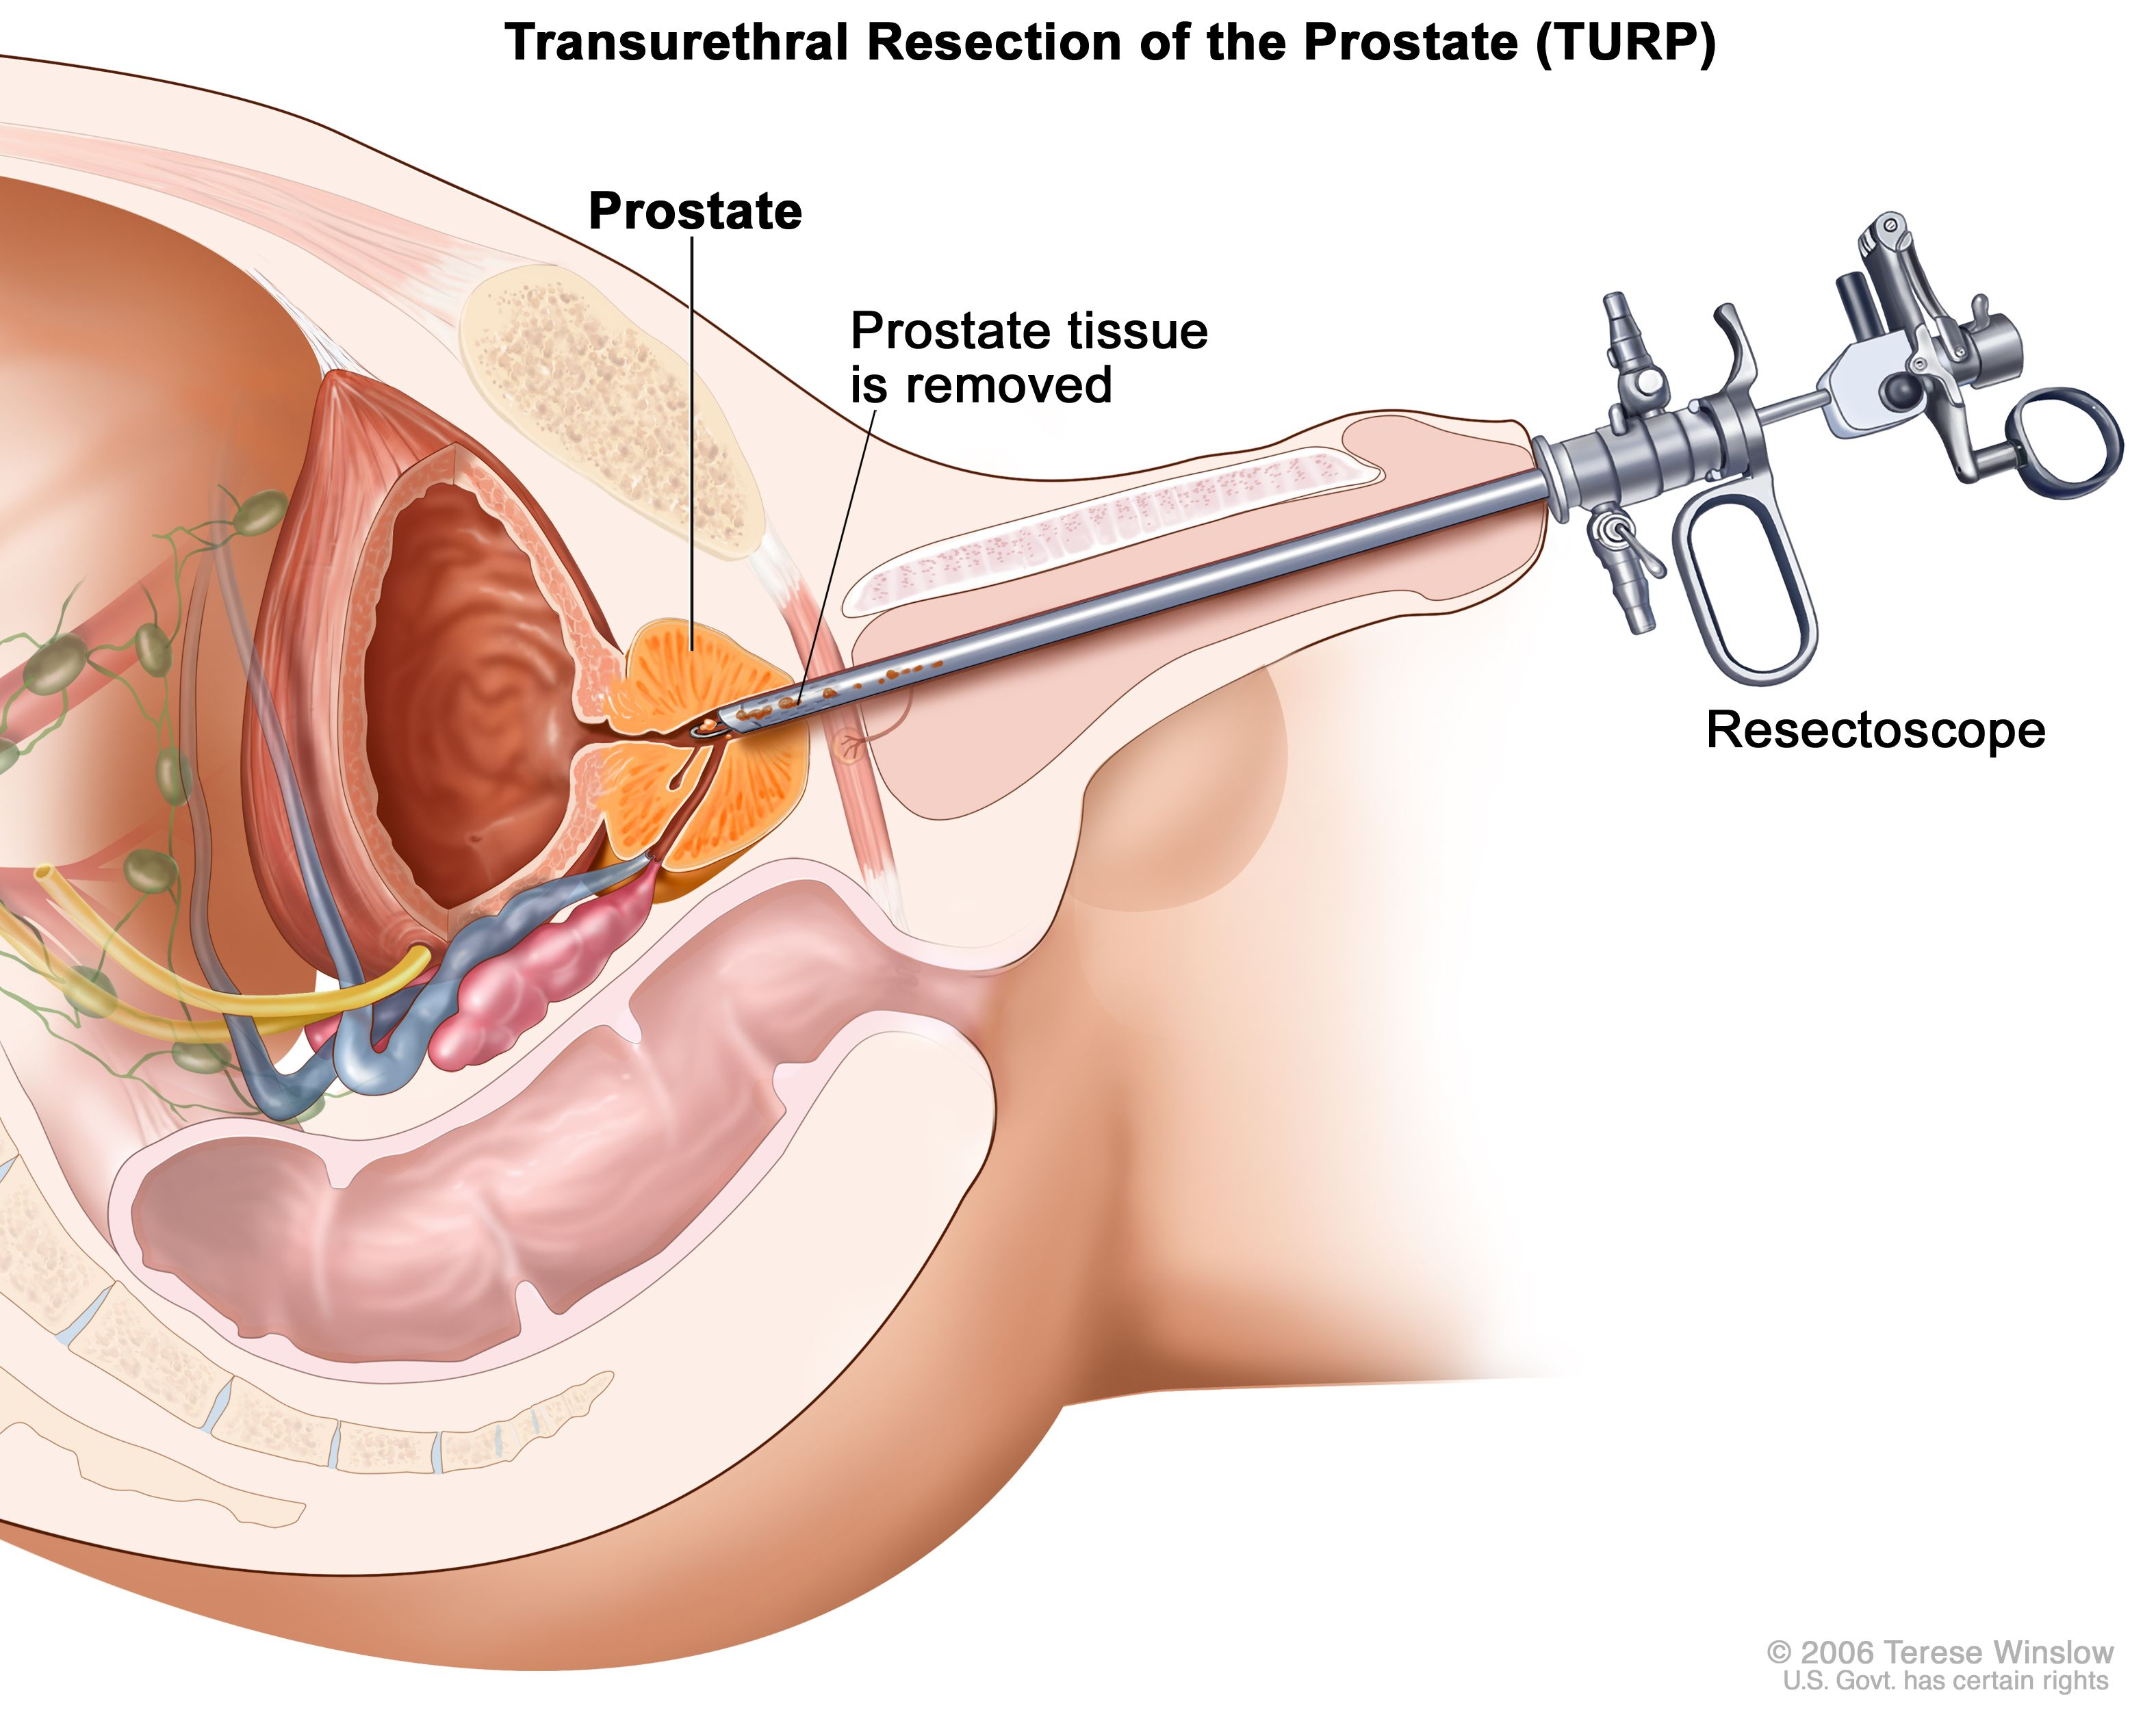 Prostcare Treatment of Enlarged prostate problems, PSA, Prostatitis, Brits